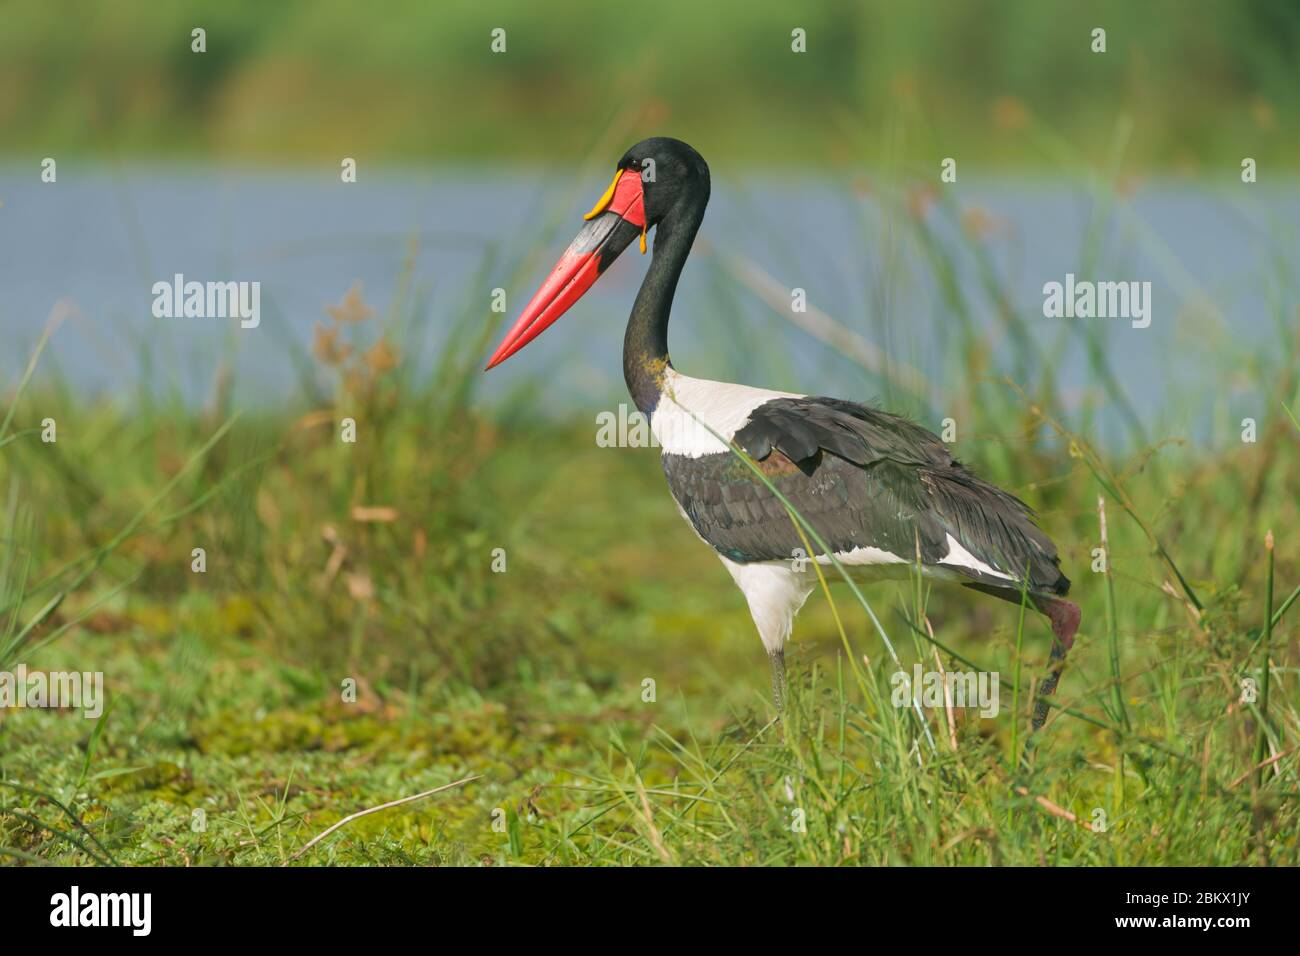 Saddle-billed stork, saddlebill, Ephippiorhynchus senegalensis, Murchison Falls national park, Uganda Stock Photo